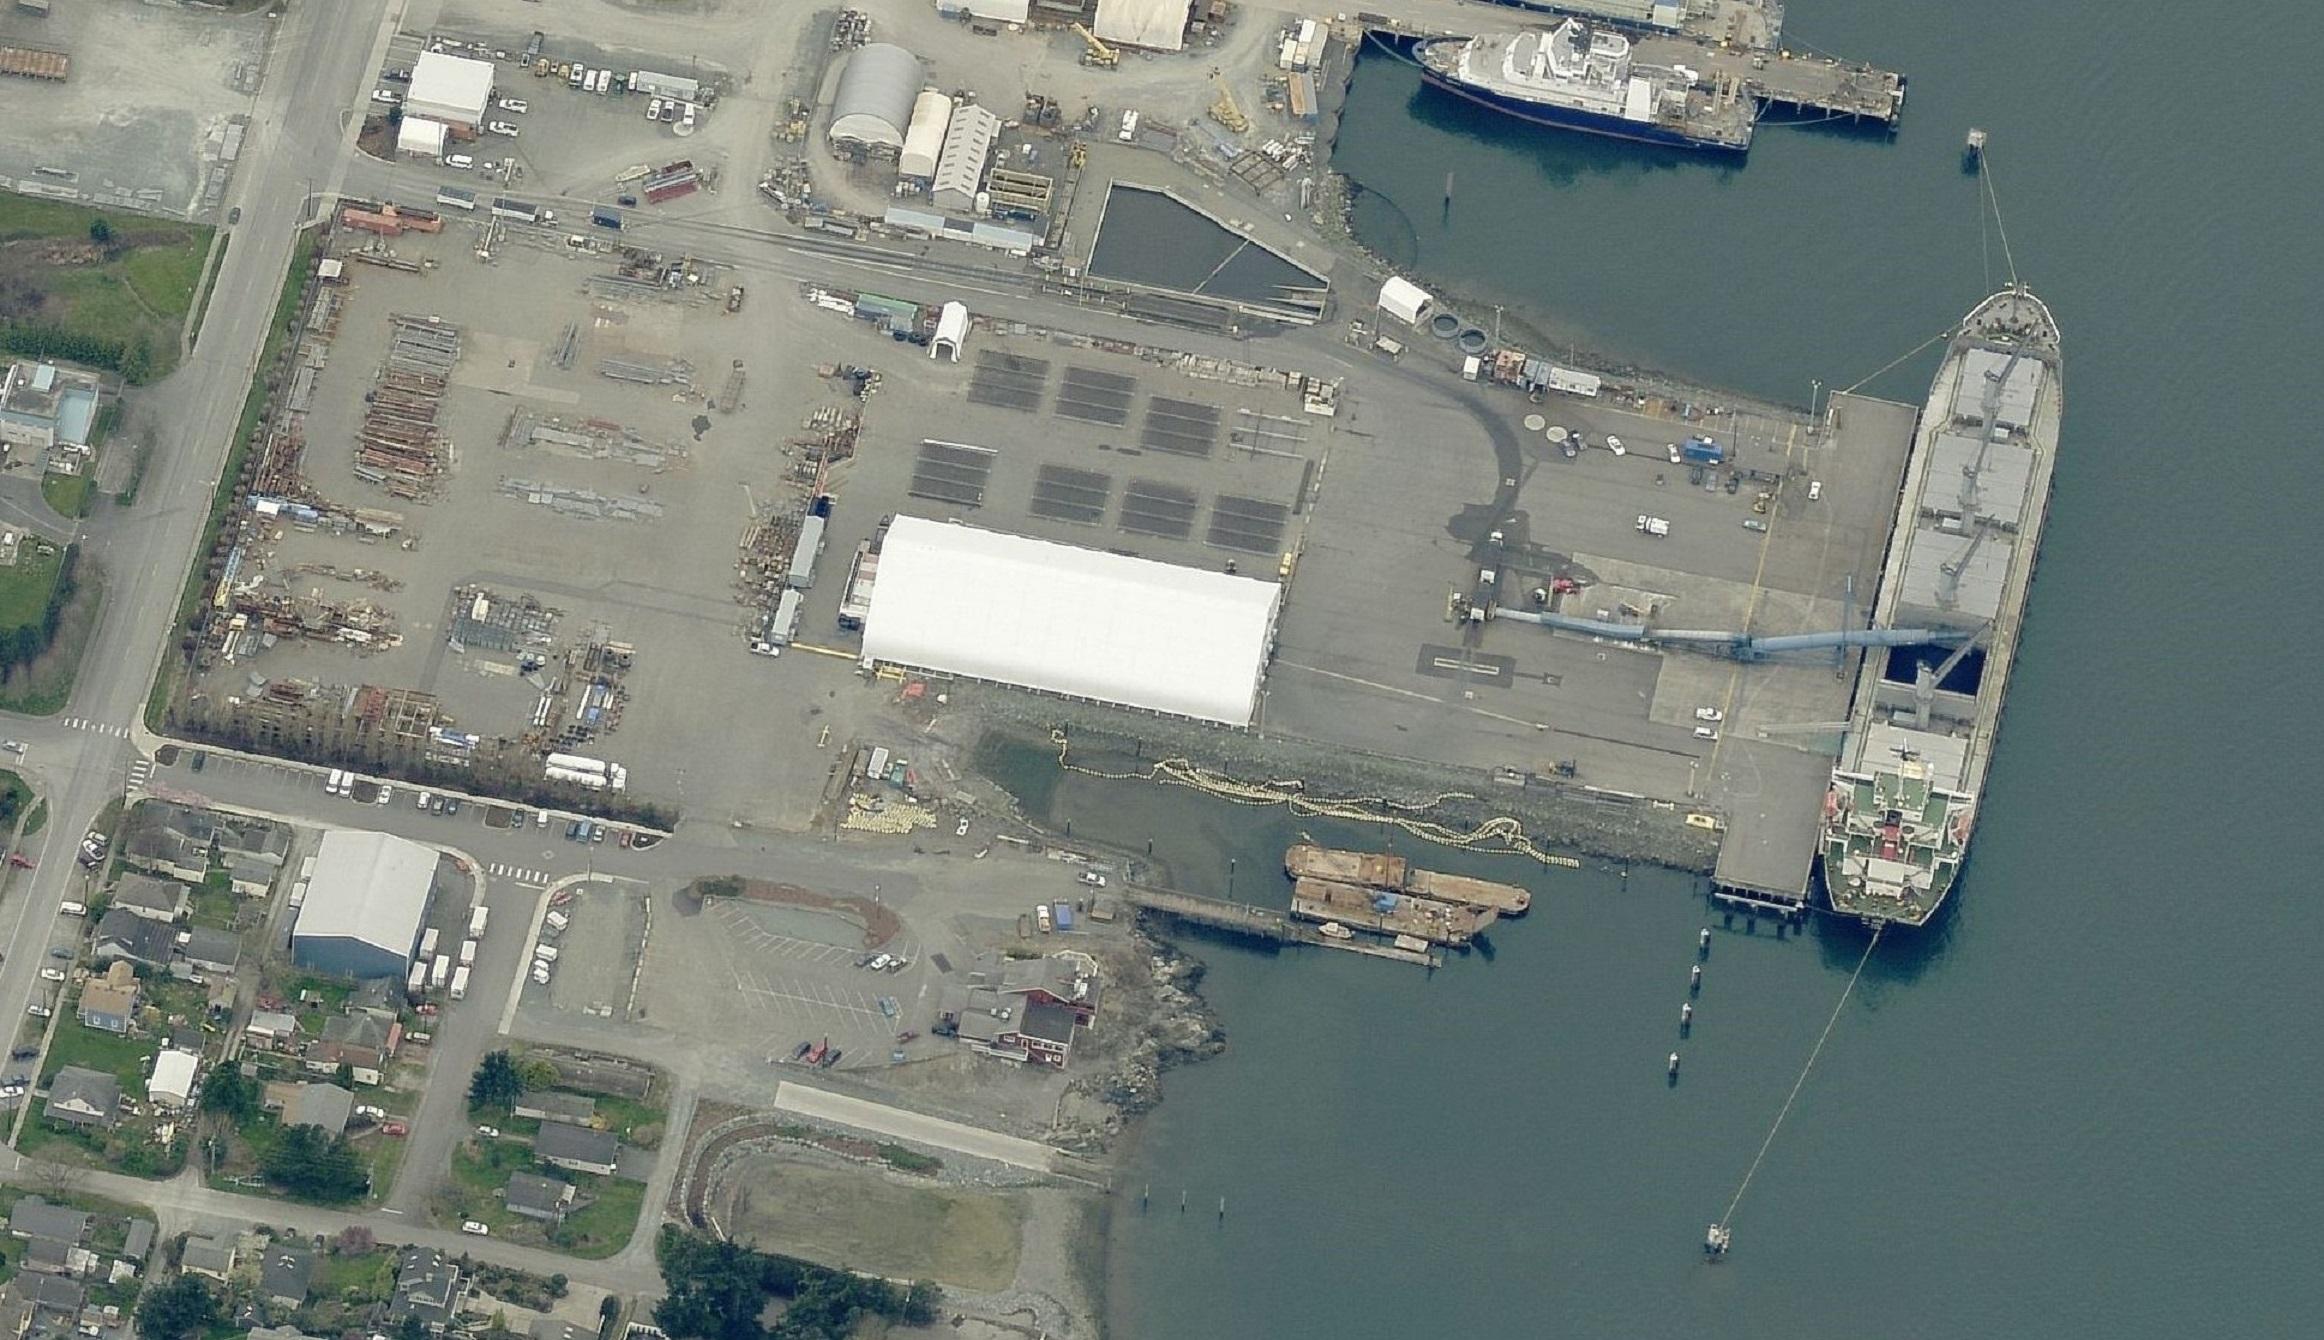 Anacortes Port Log Yard Site